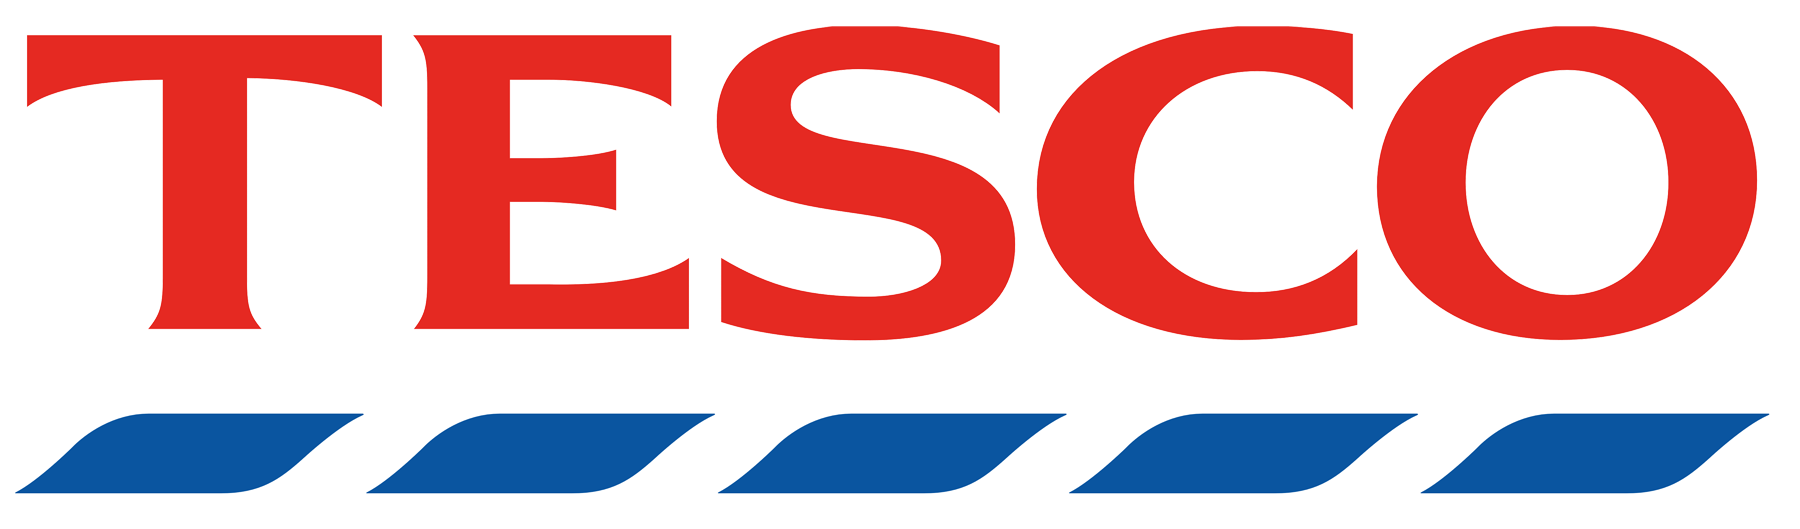 Tesco Logo, Tesco Symbol, Meaning, History and Evolution